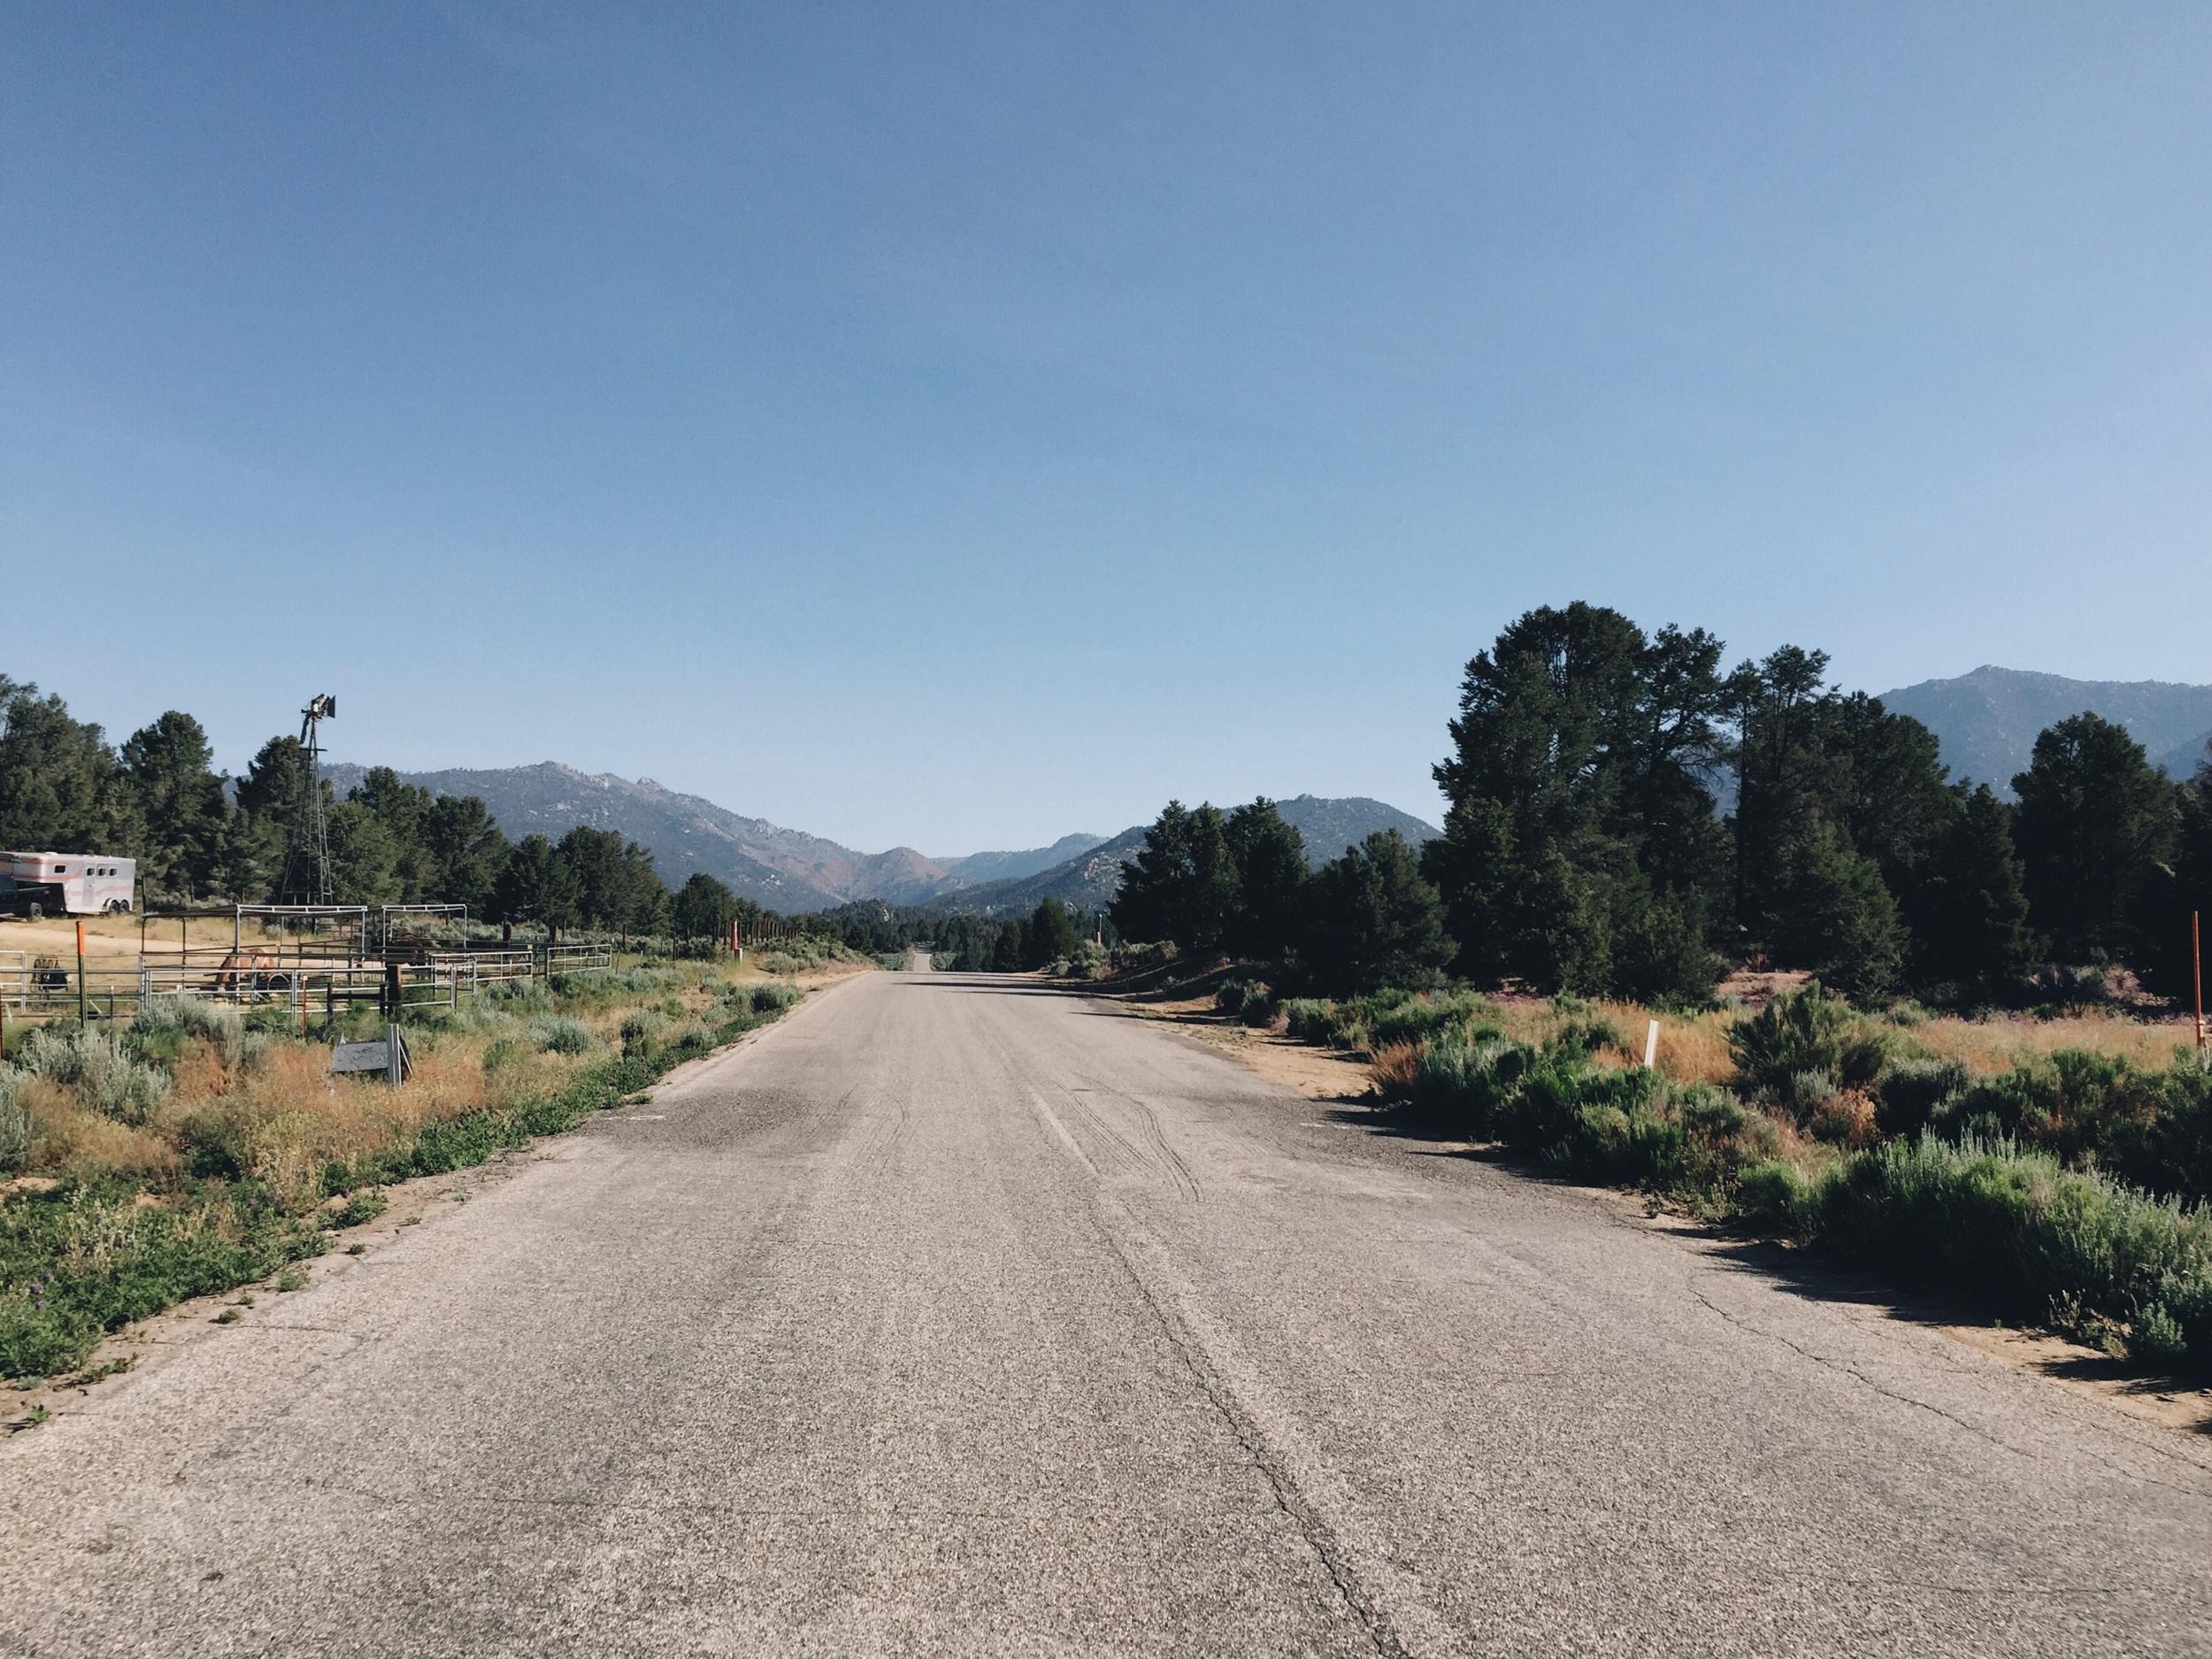 Sherman pass road, I forgot to turn here.